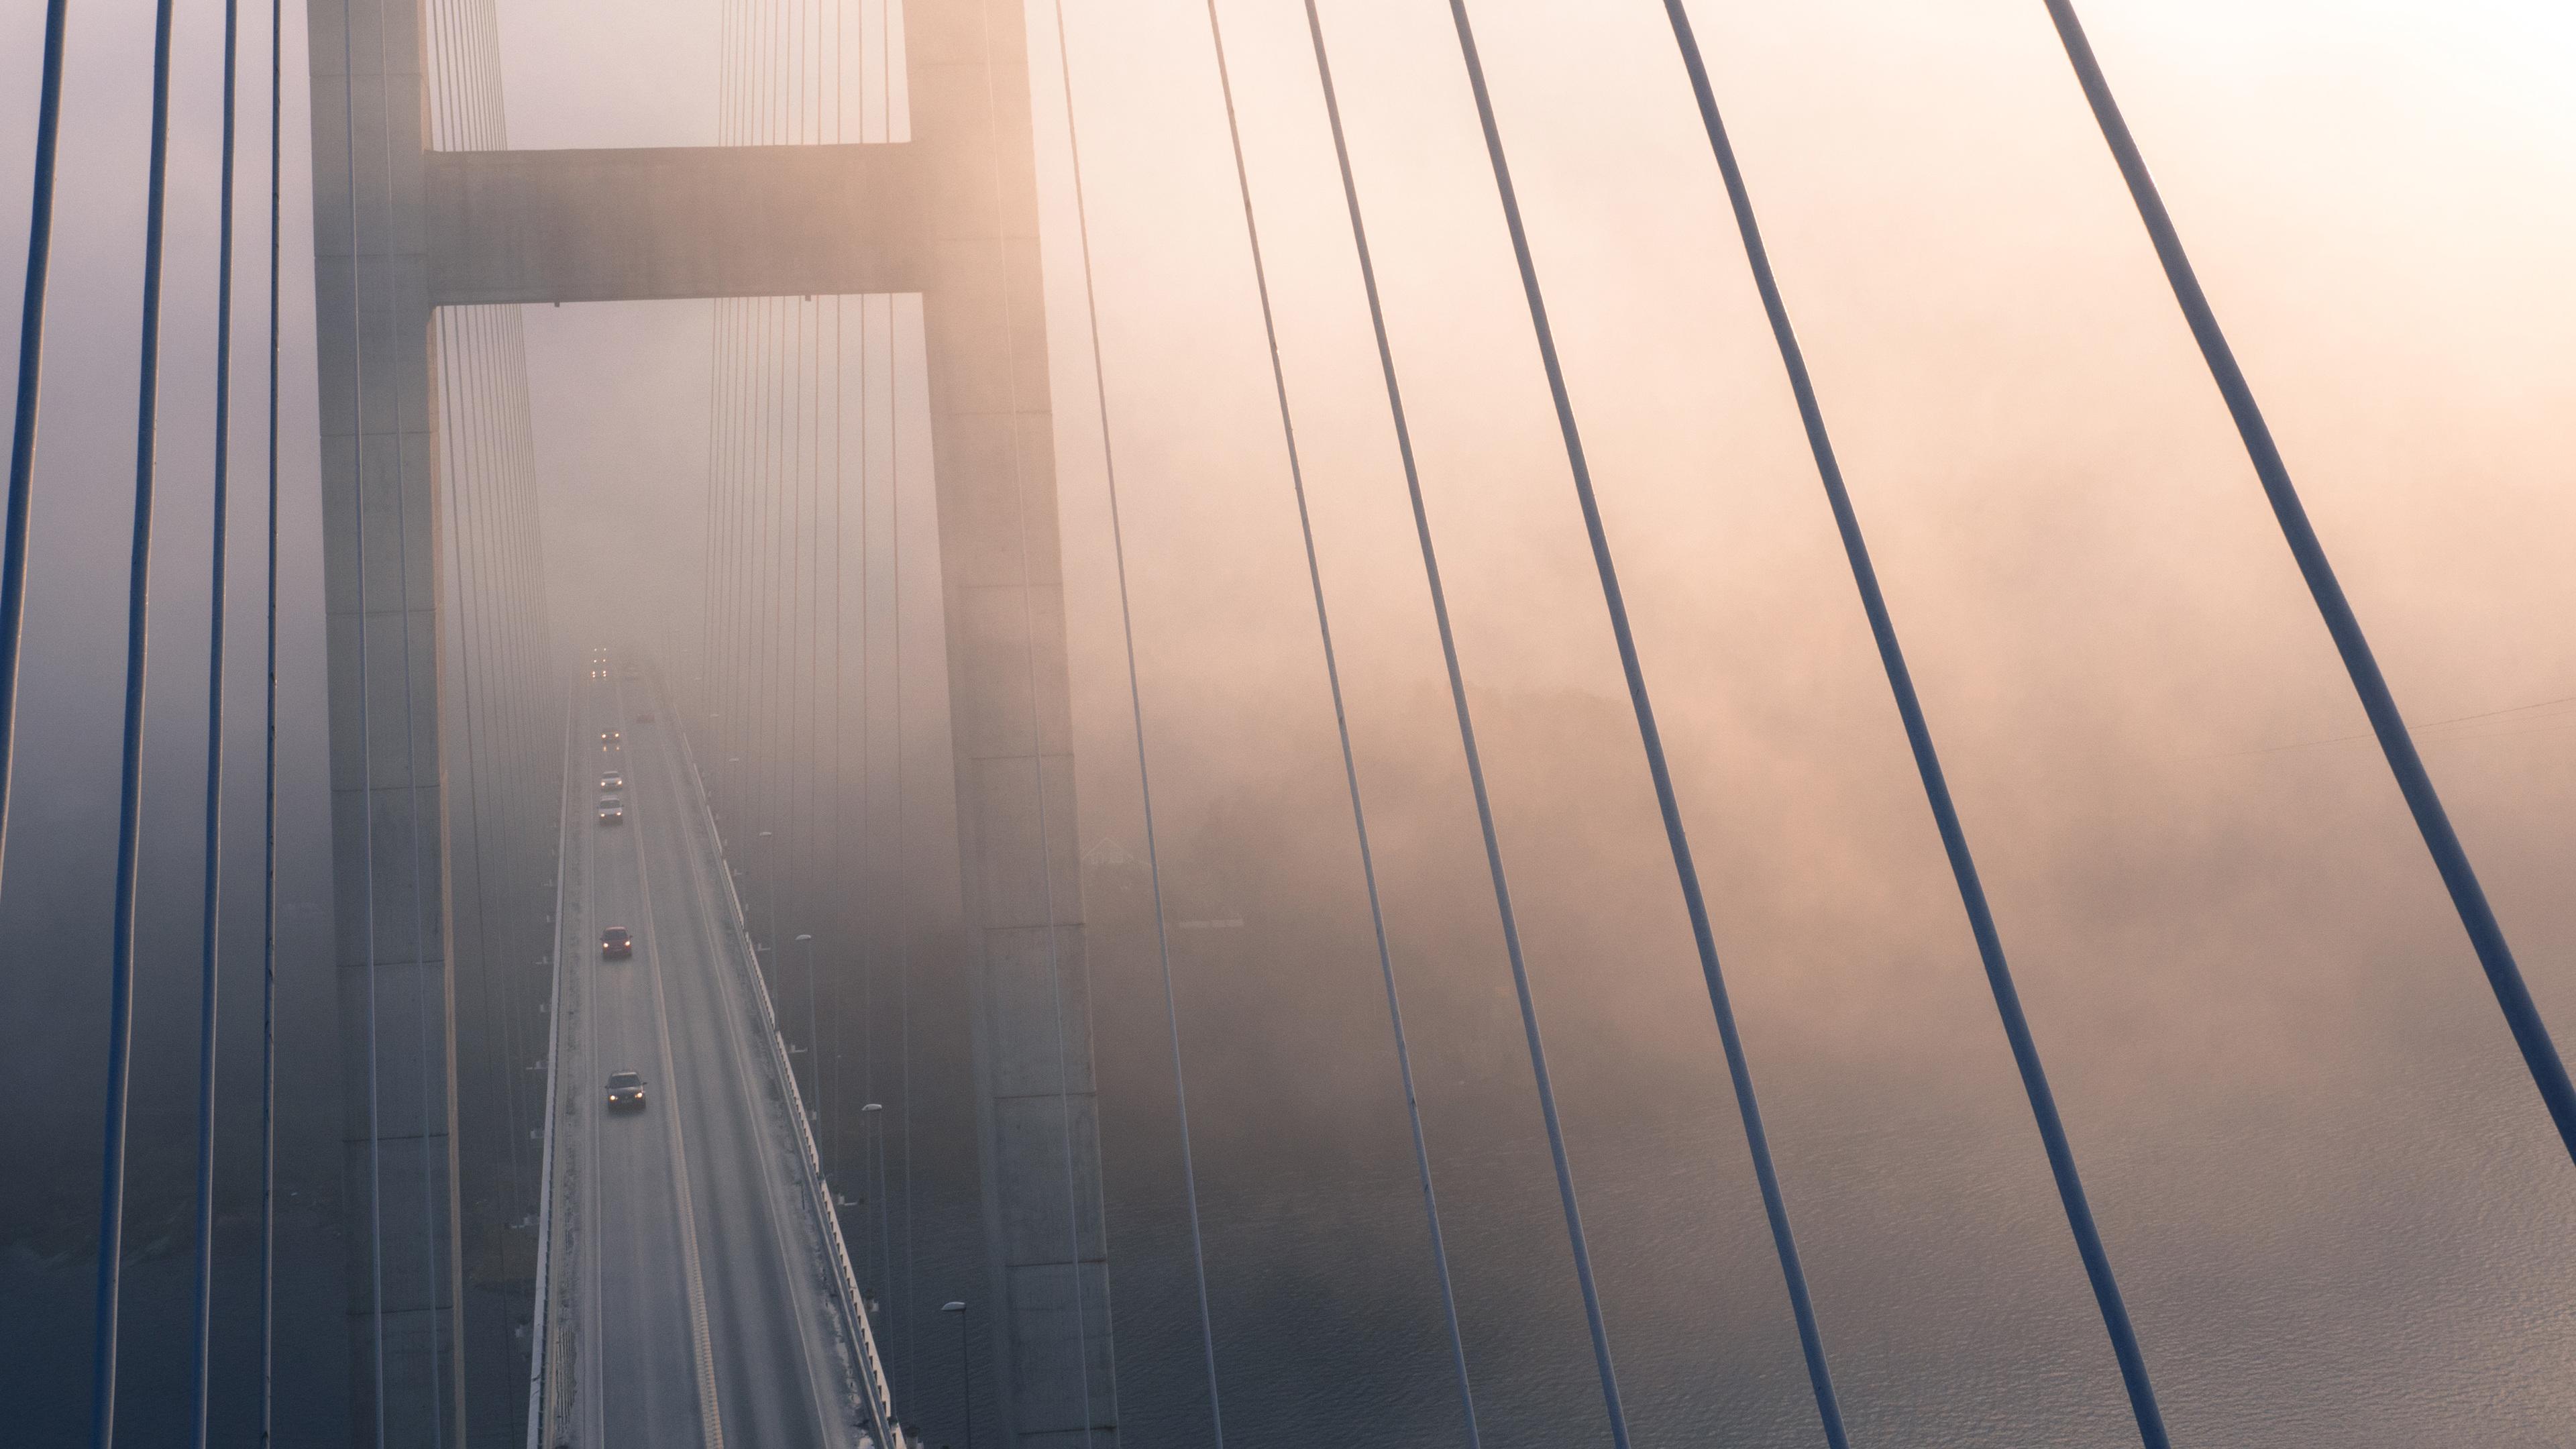 suspension bridge view from top evening fog 4k 1540136745 - Suspension Bridge View From Top Evening Fog 4k - suspension bridge wallpapers, nature wallpapers, hd-wallpapers, fog wallpapers, evening wallpapers, bridge wallpapers, 4k-wallpapers